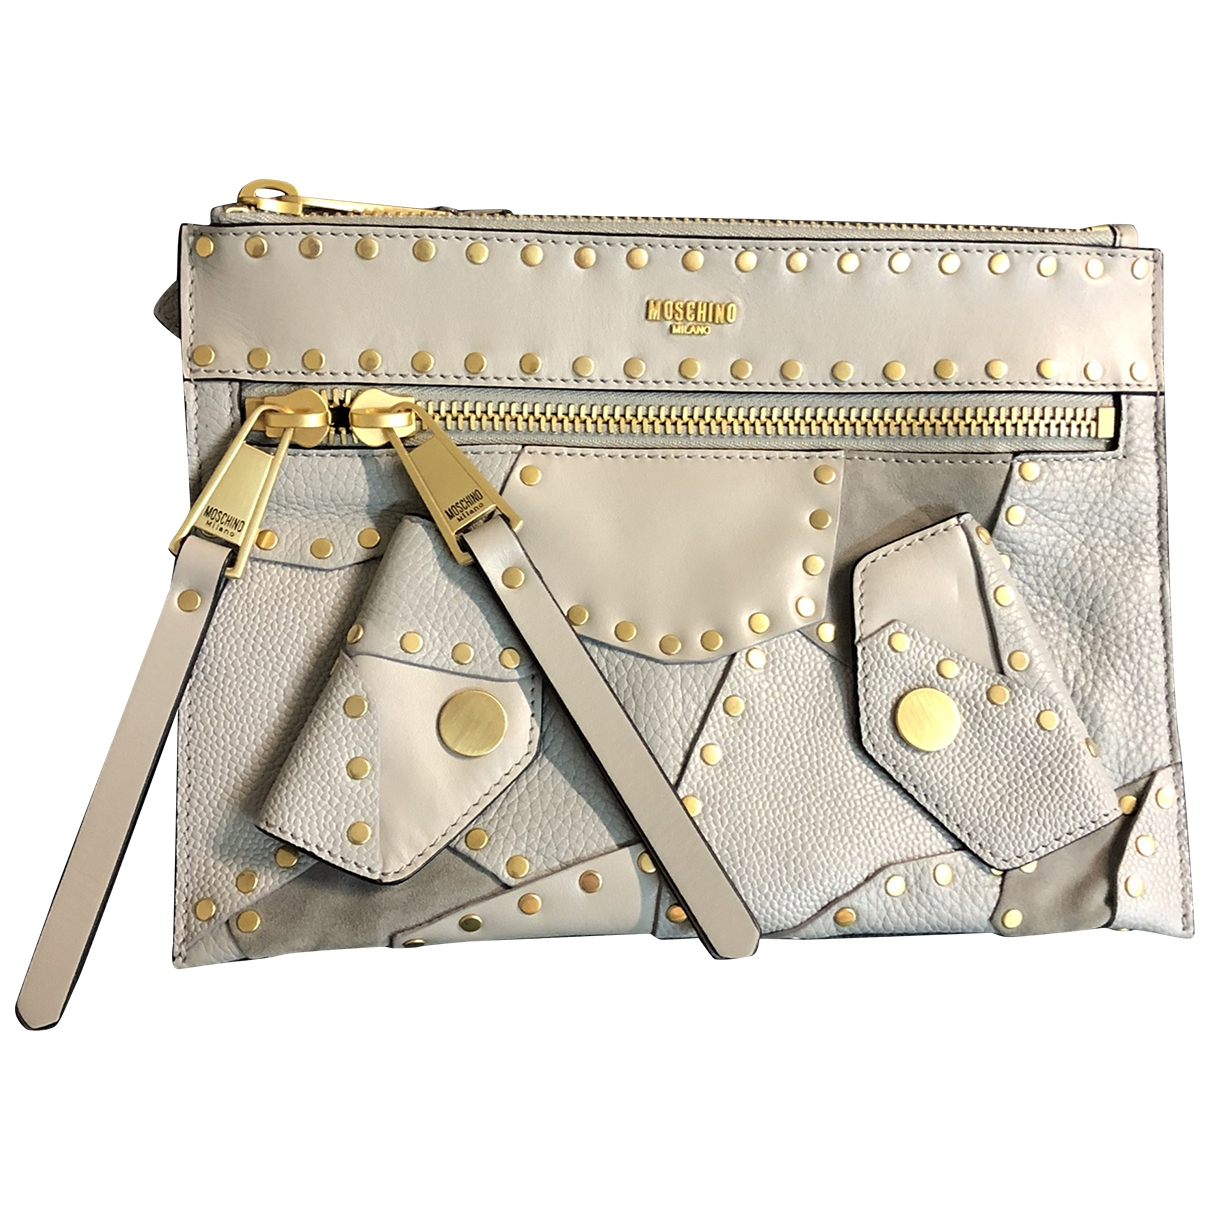 Moschino \N Grey Leather Clutch bag for Women \N